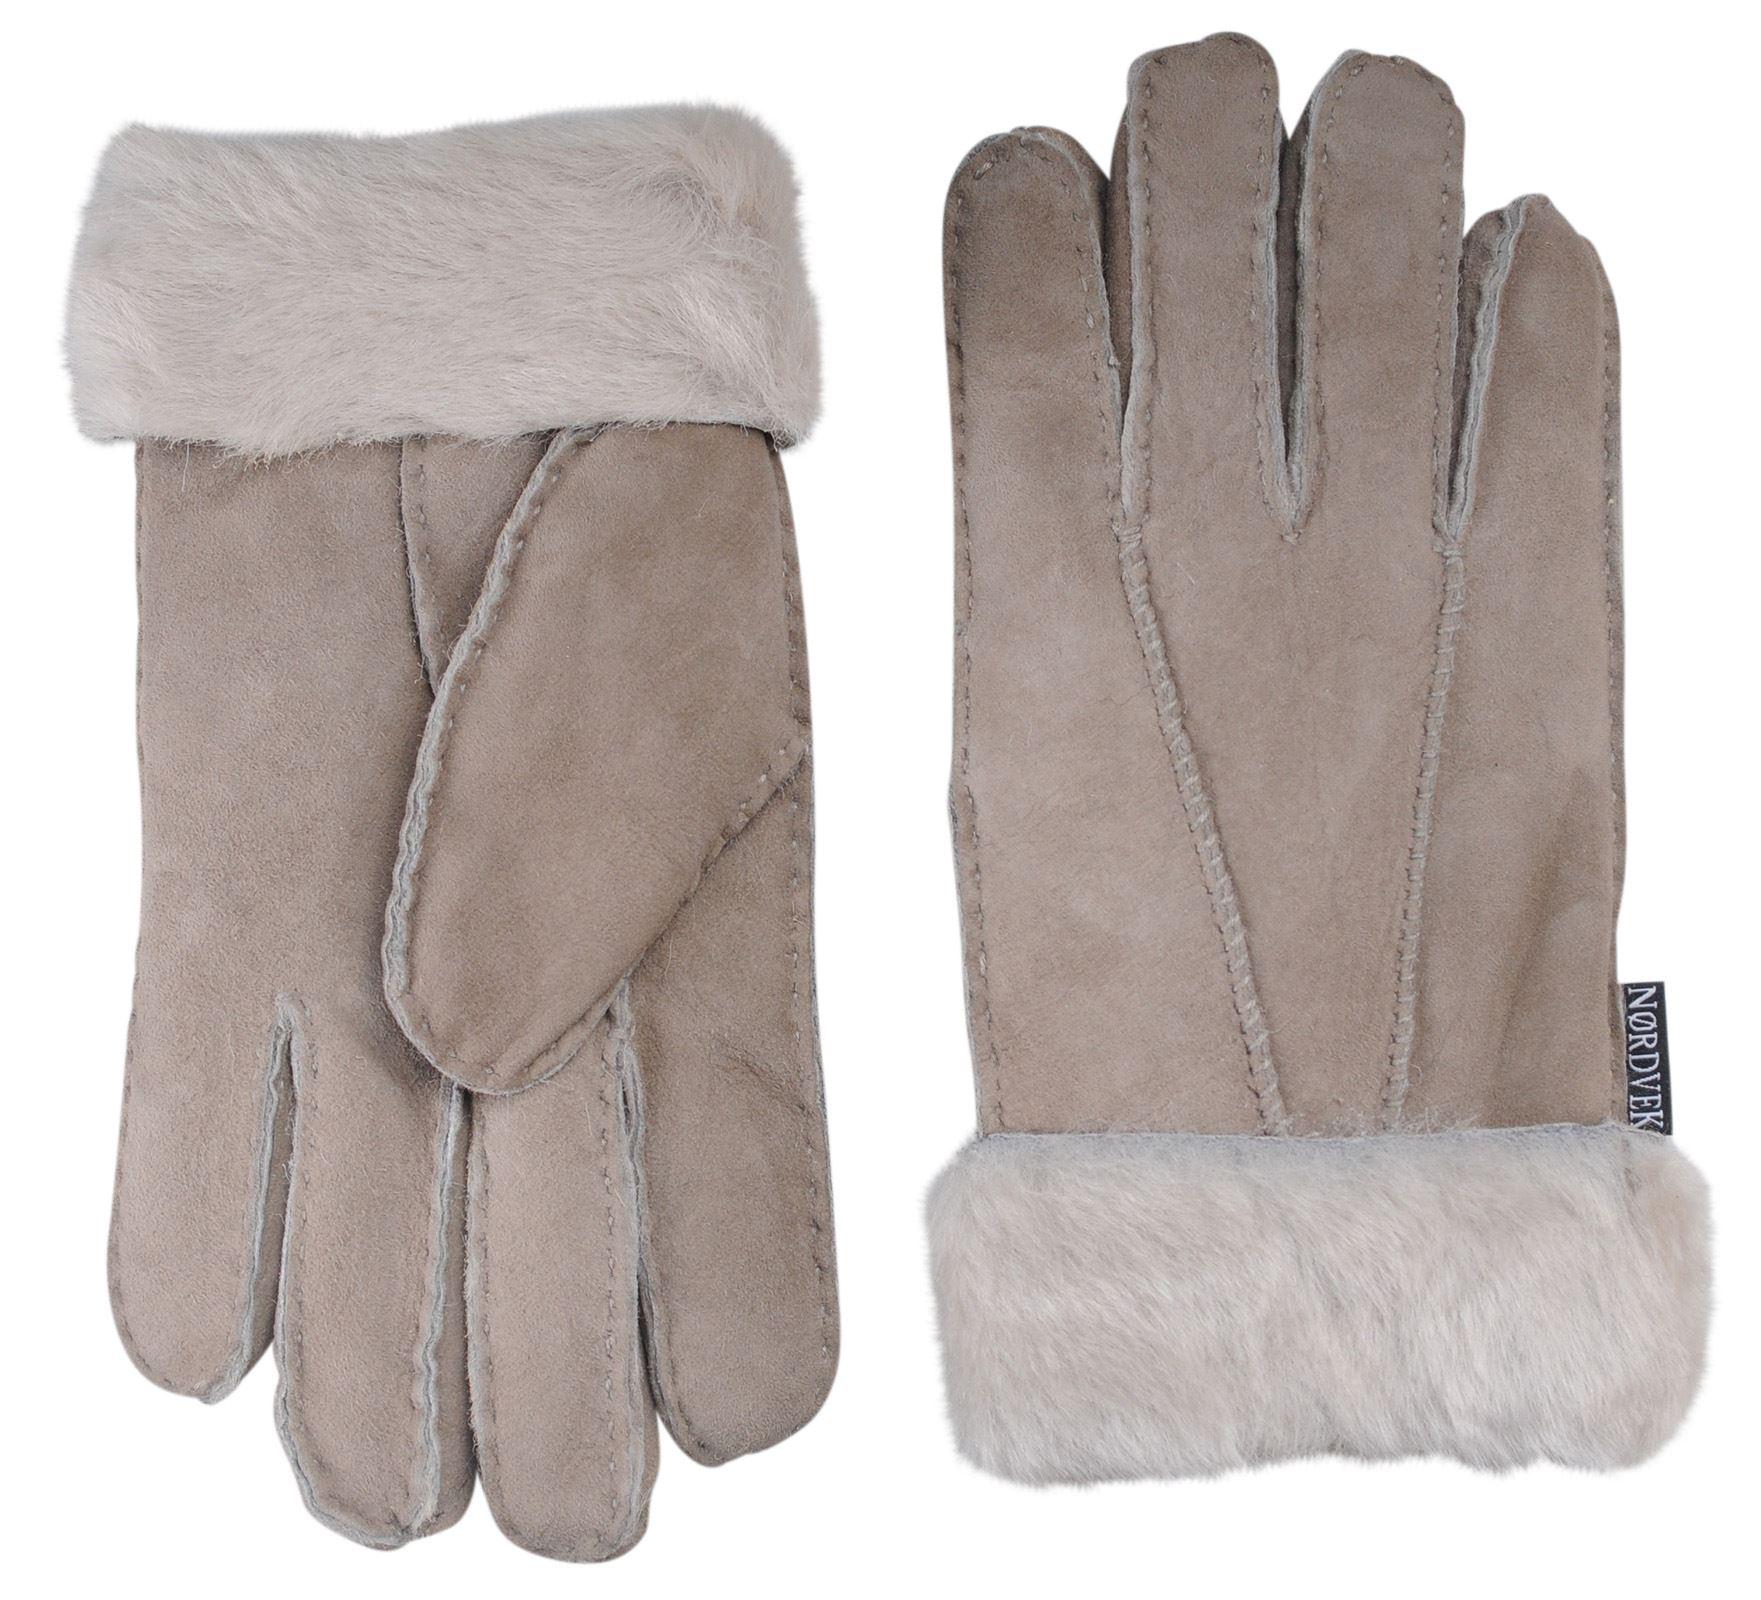 Nordvek 100/% Sheepskin Gloves Ladies Venitian Grey Size XL  Brand New taupe